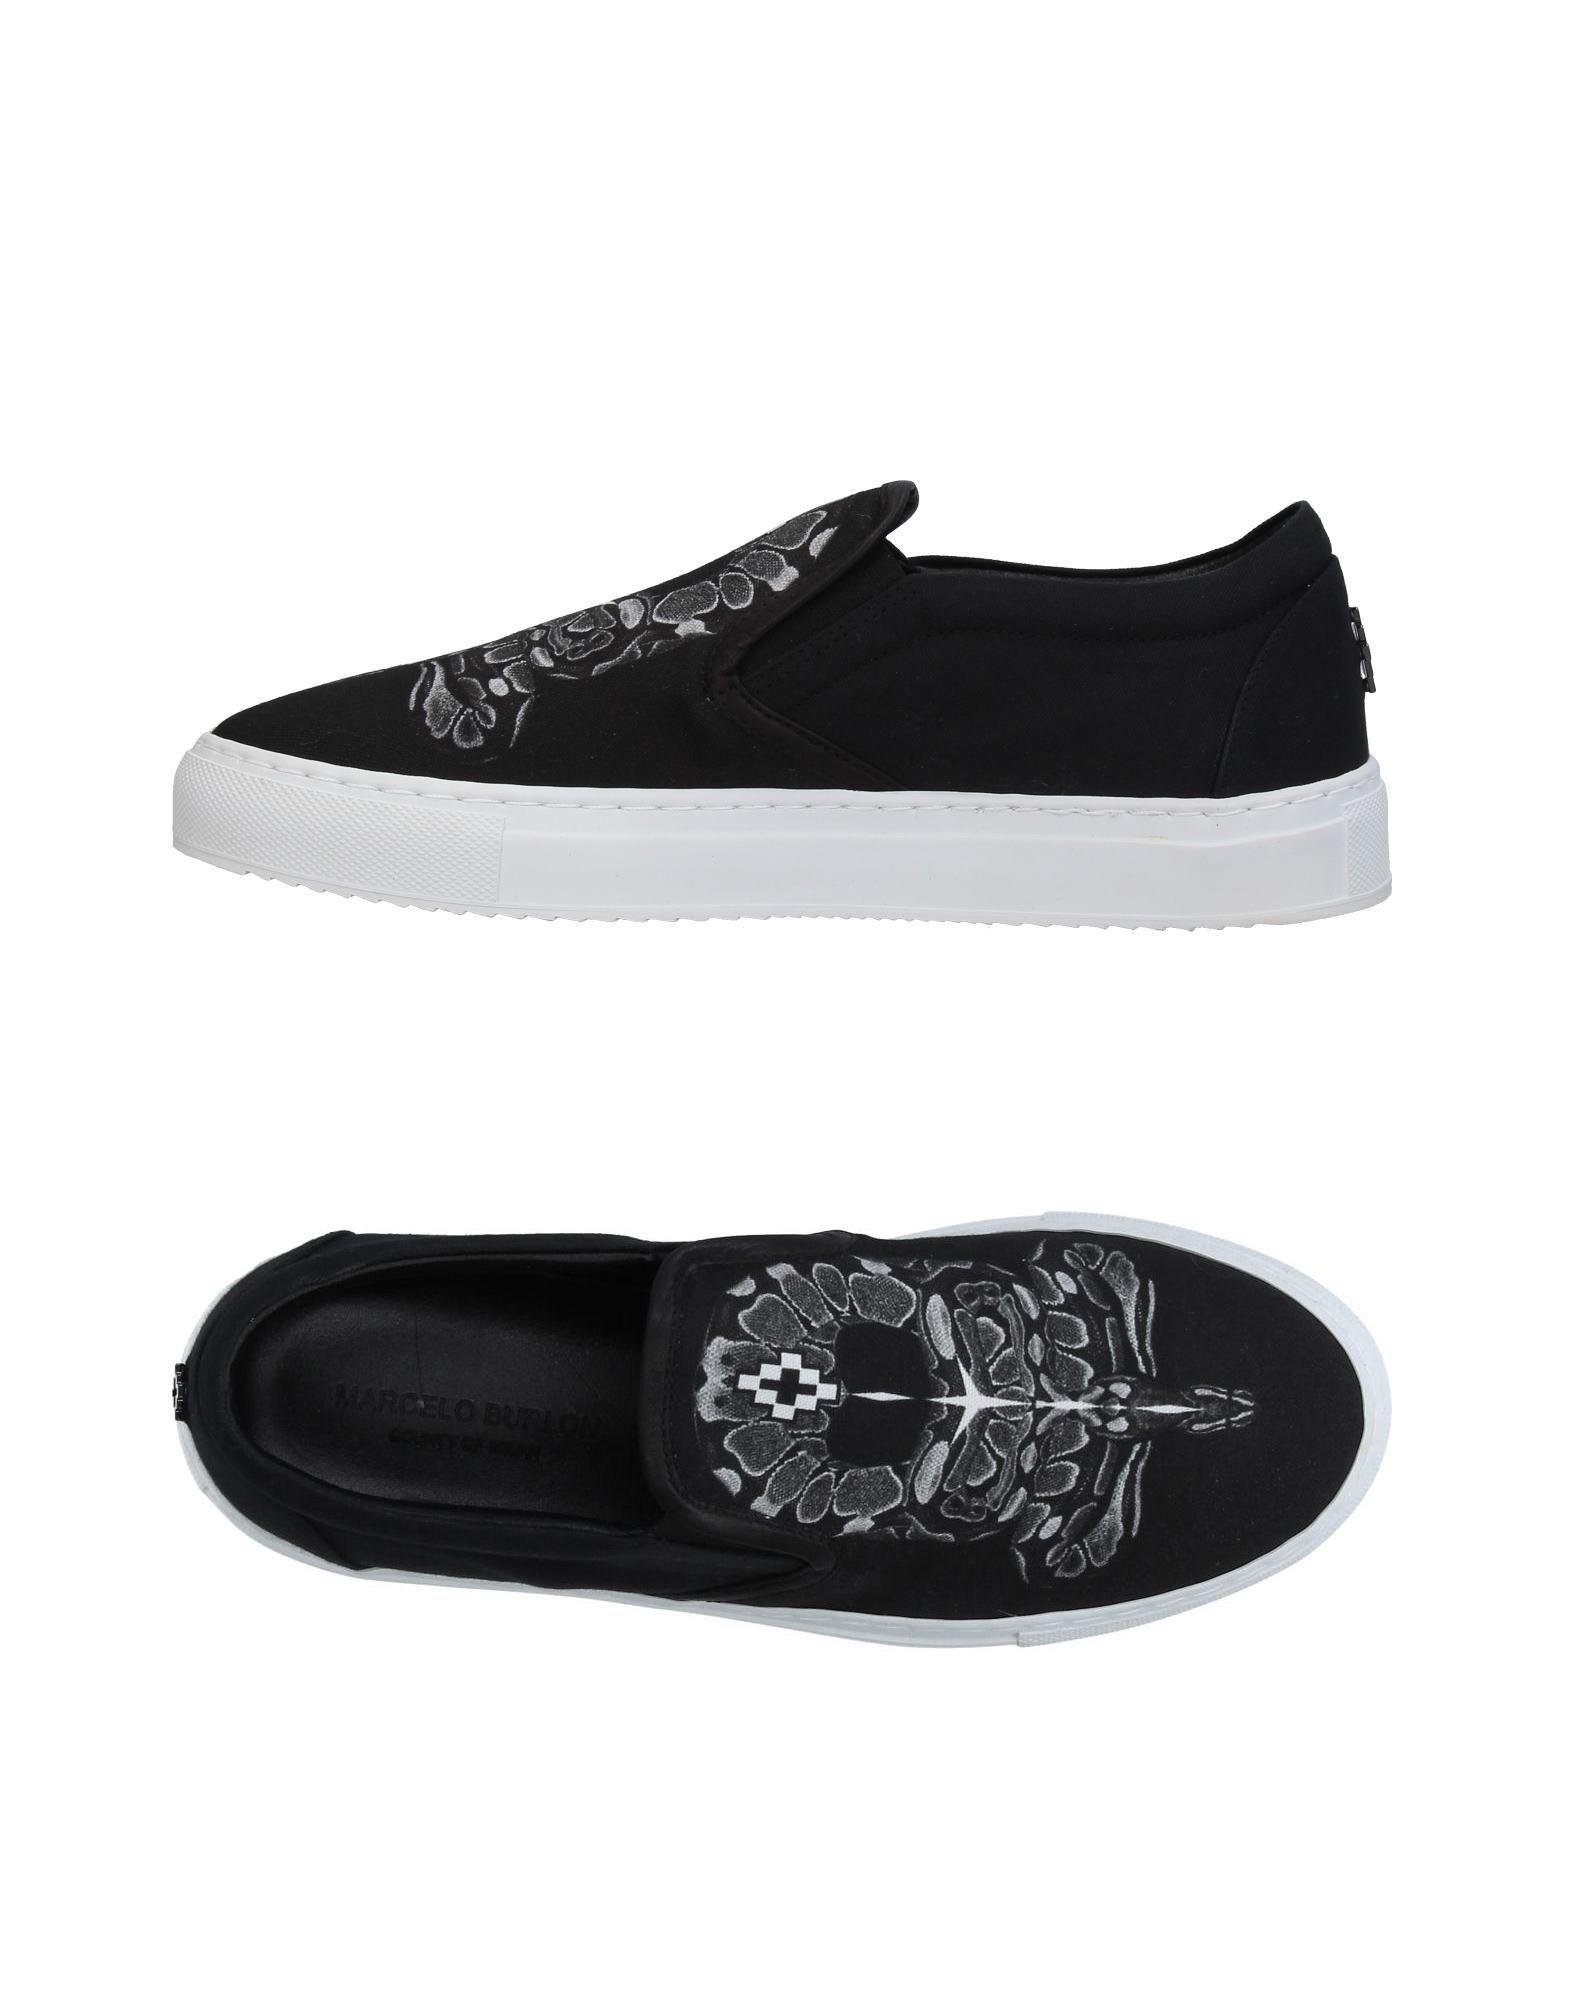 Marcelo Burlon Sneakers Damen  Qualität 11355361RK Gute Qualität  beliebte Schuhe af1fae